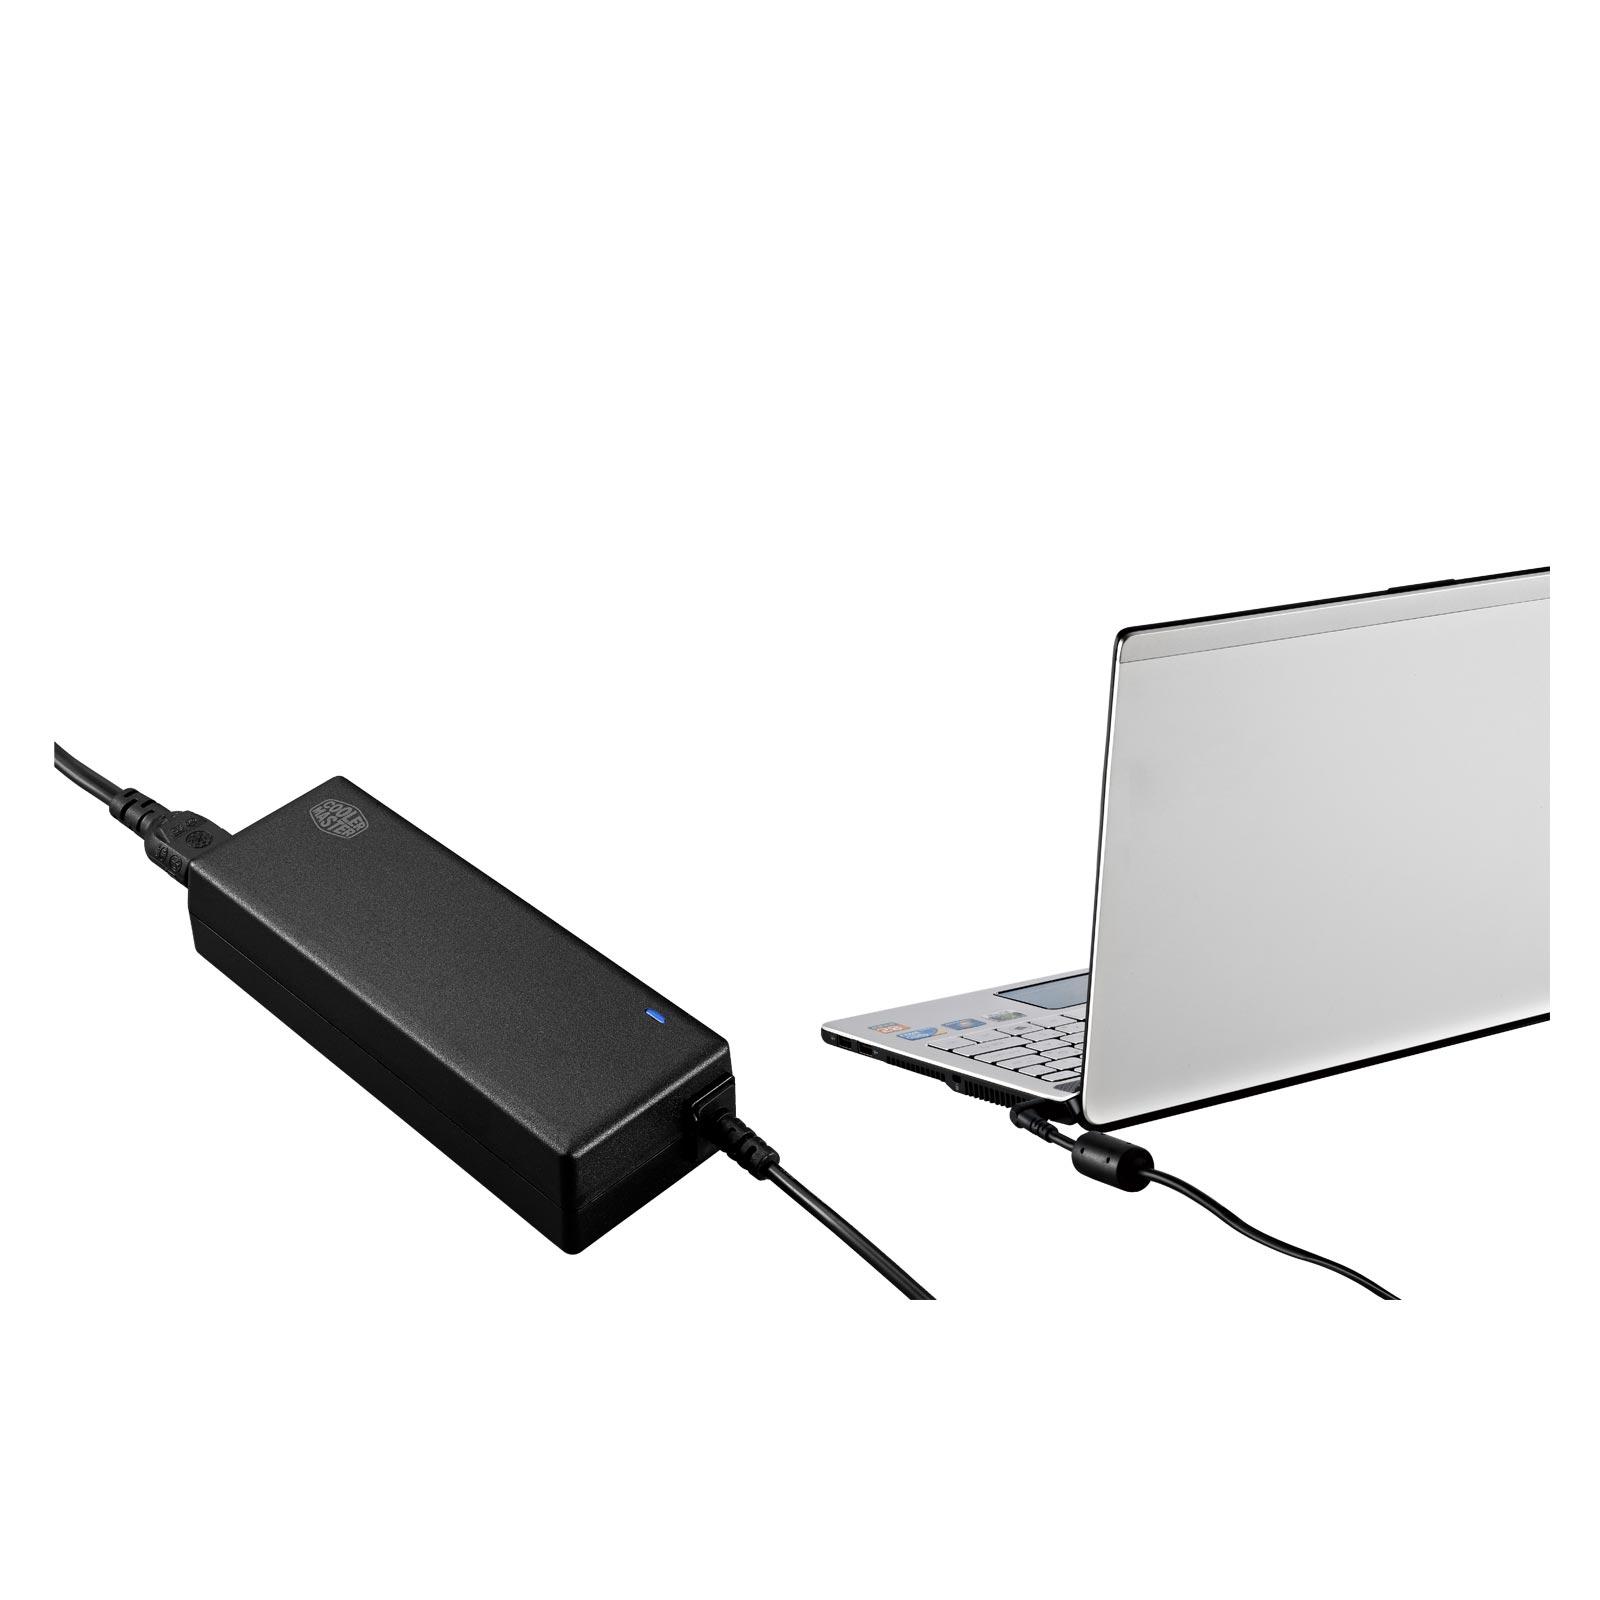 alimentation chargeur universel pour pc portable cooler master 65w. Black Bedroom Furniture Sets. Home Design Ideas